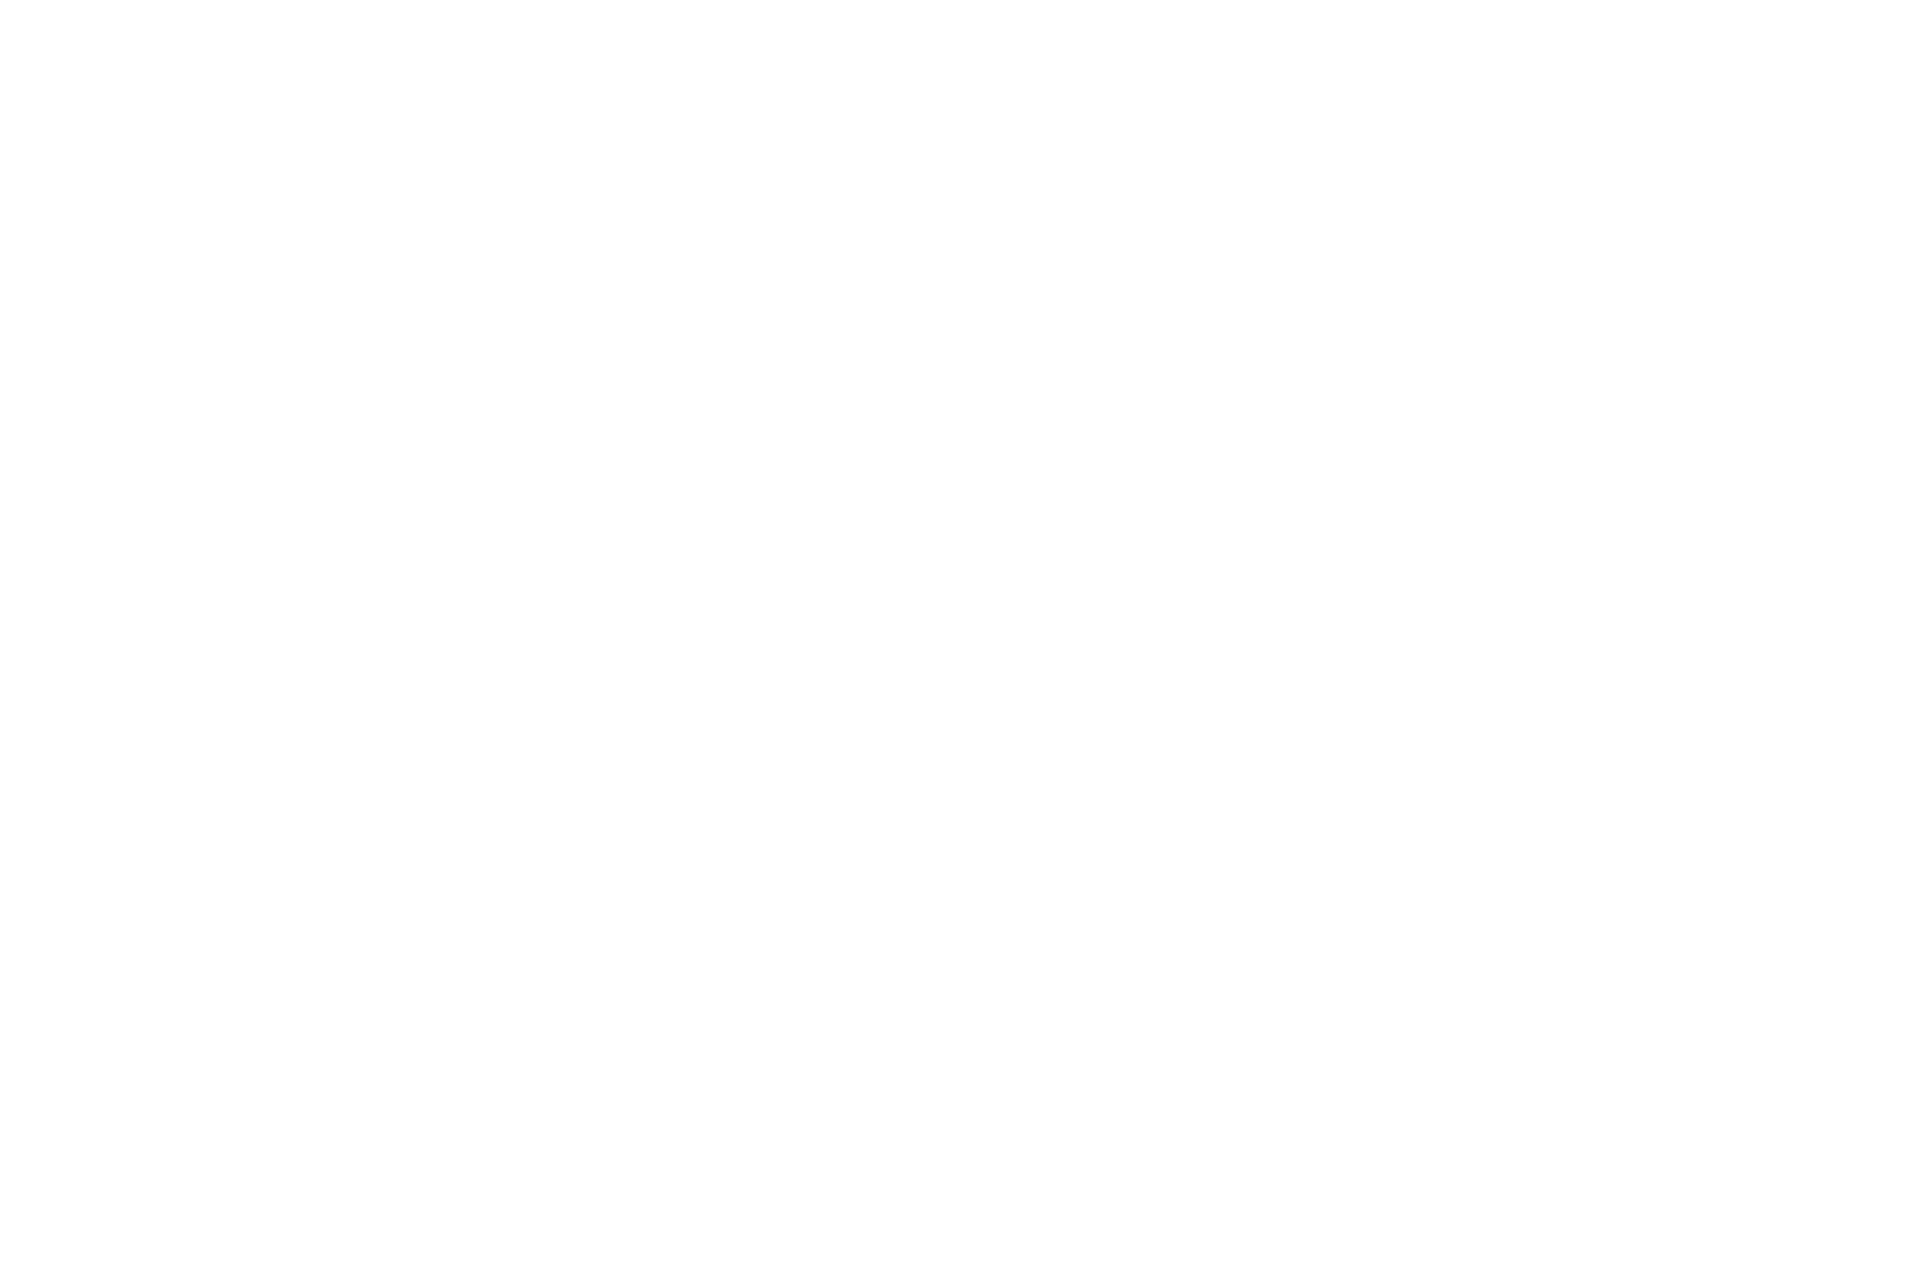 ۲۰۷۱۰۷-۱۹۲۰×۱۲۸۰-almond-tree-compressor